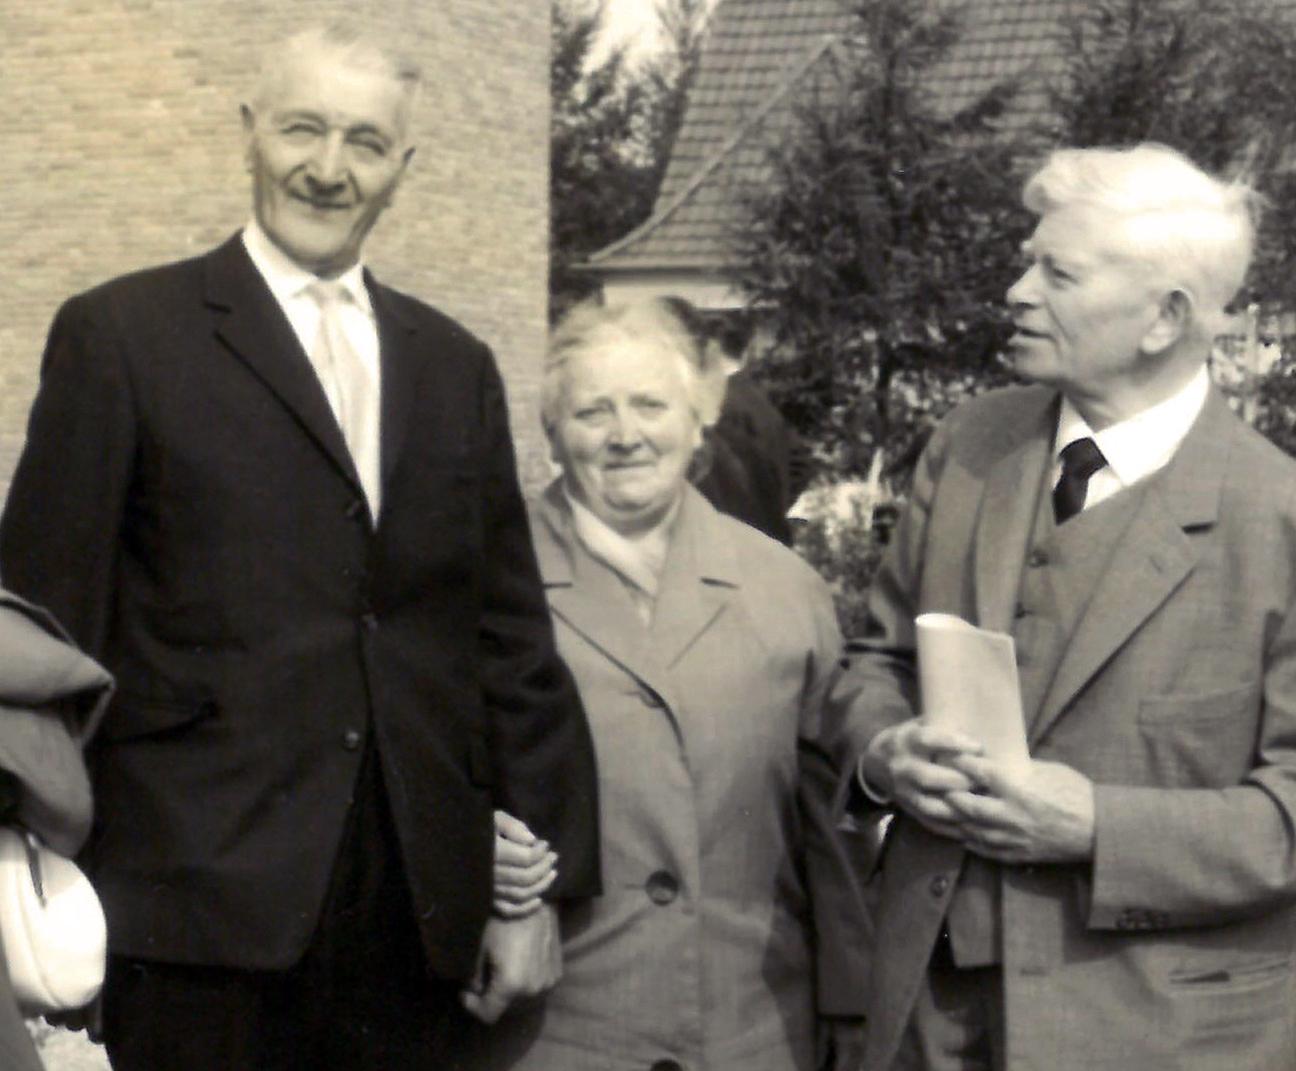 Freudenthalpreis - 1966